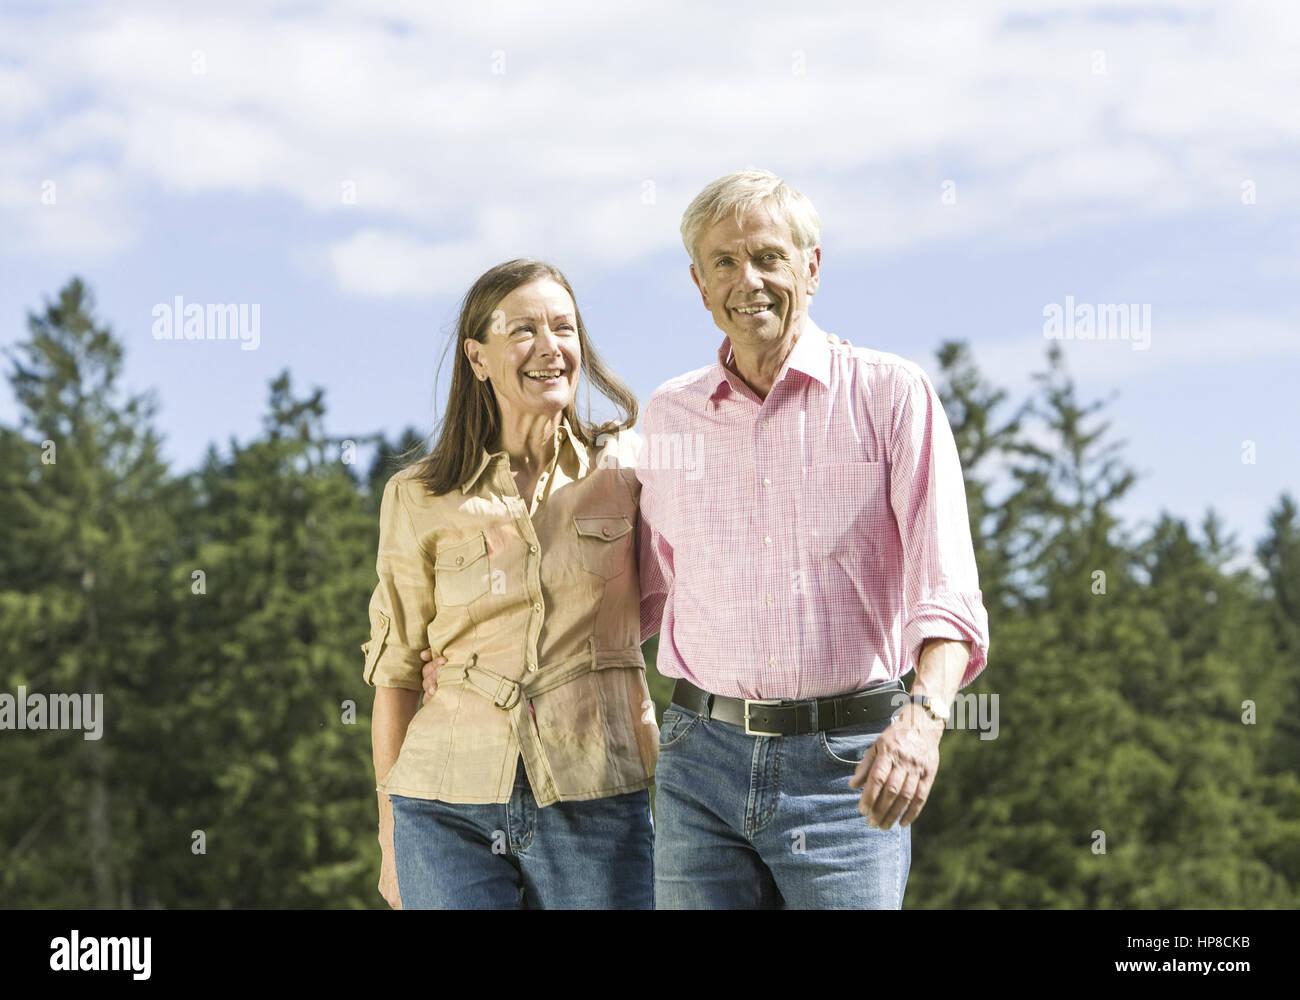 Seniorenpaar beim Spazierengehen an Waldrand (model-released) - Stock Image